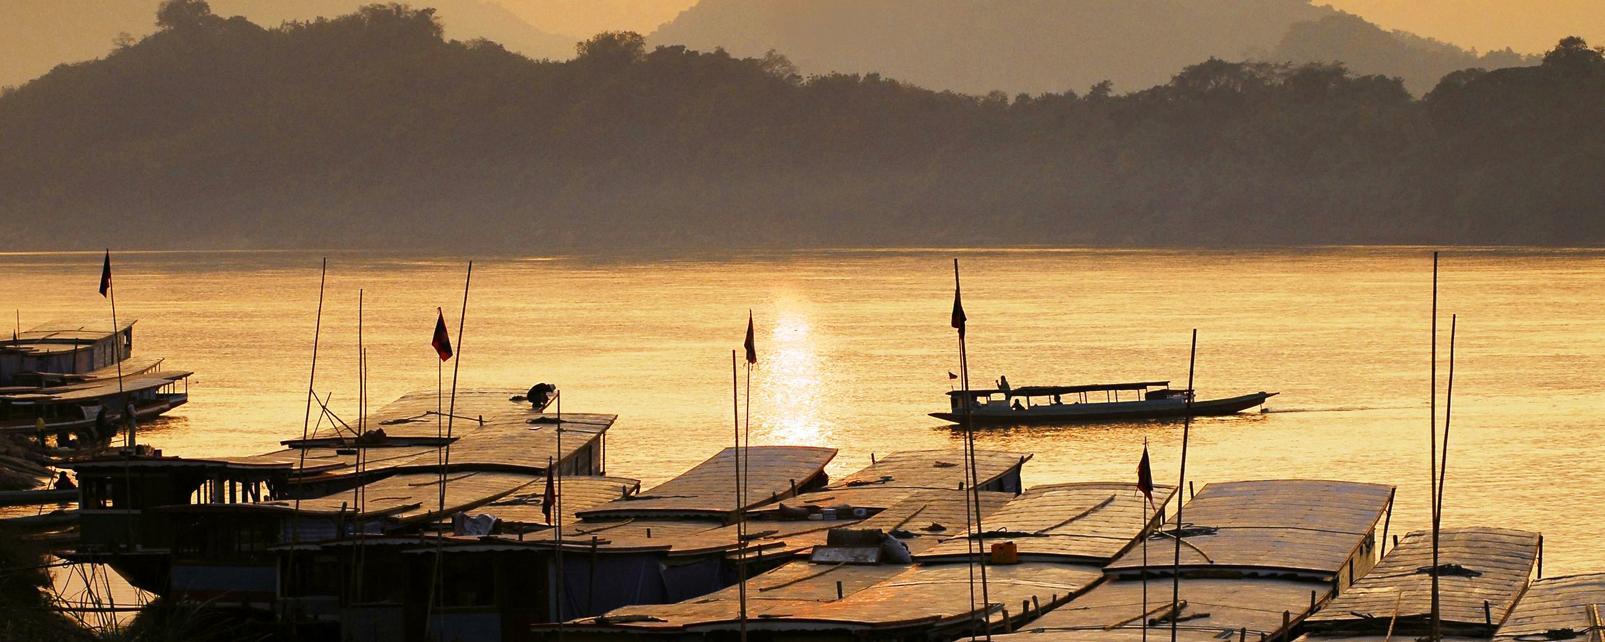 Asie, Laos, Luang Prabang, Mékong, fleuve, bateau, montagne, port,